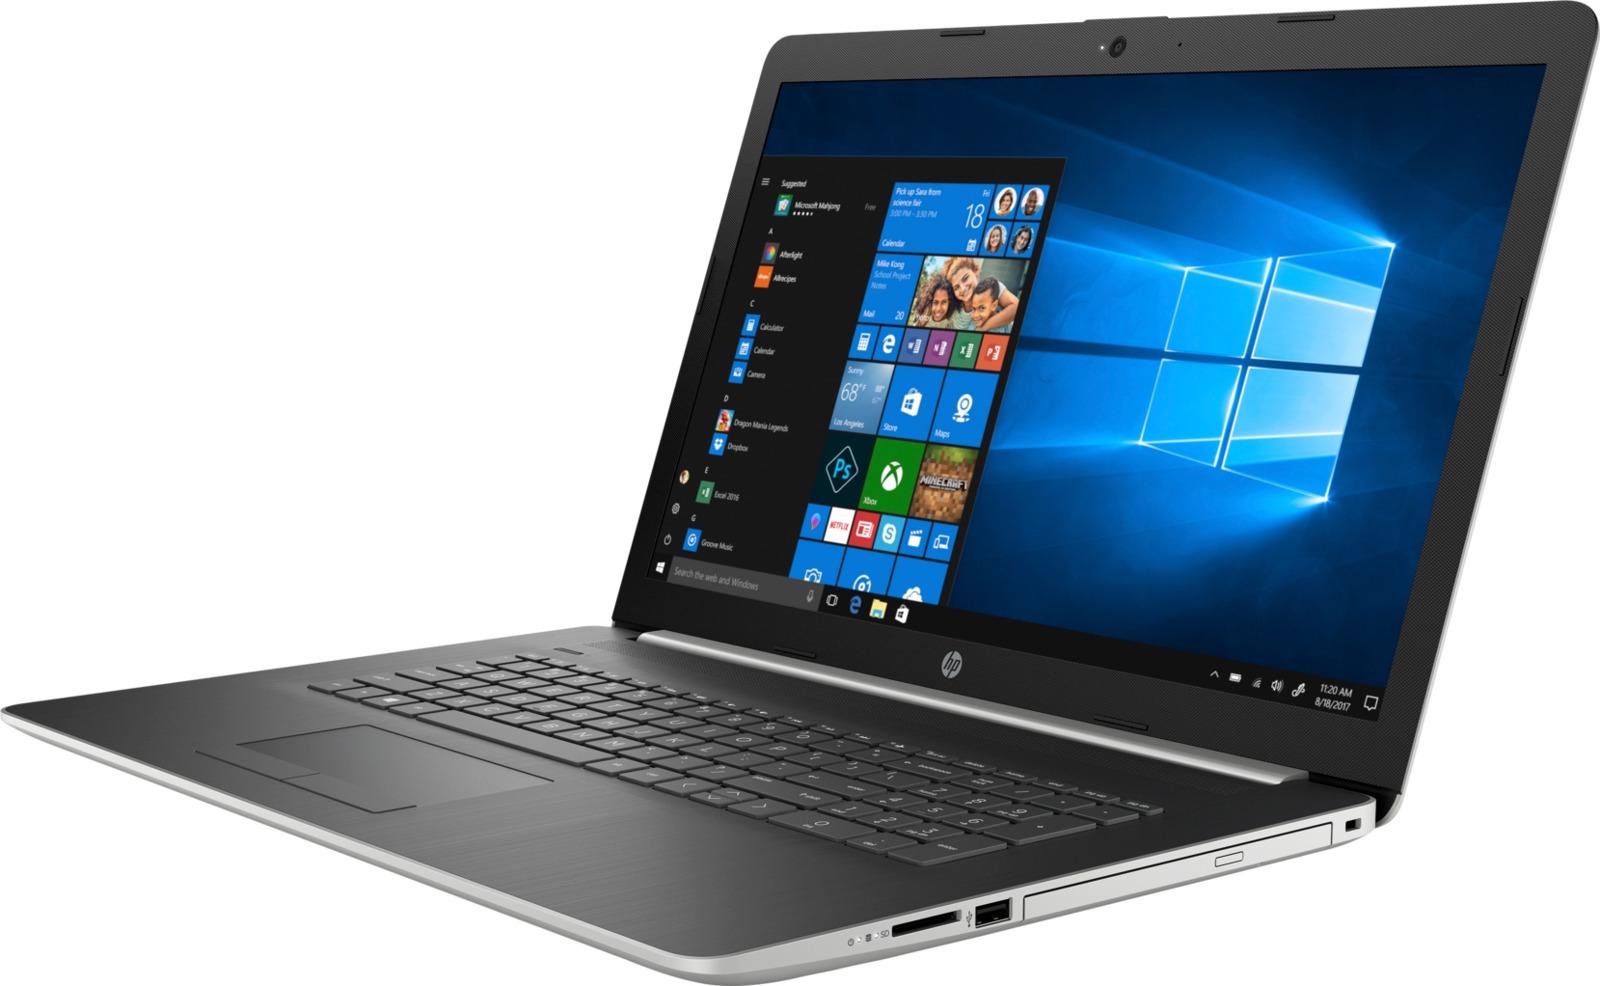 17.3 Ноутбук HP 17-by0019ur 4KH59EA, серебристый ноутбук цена качество